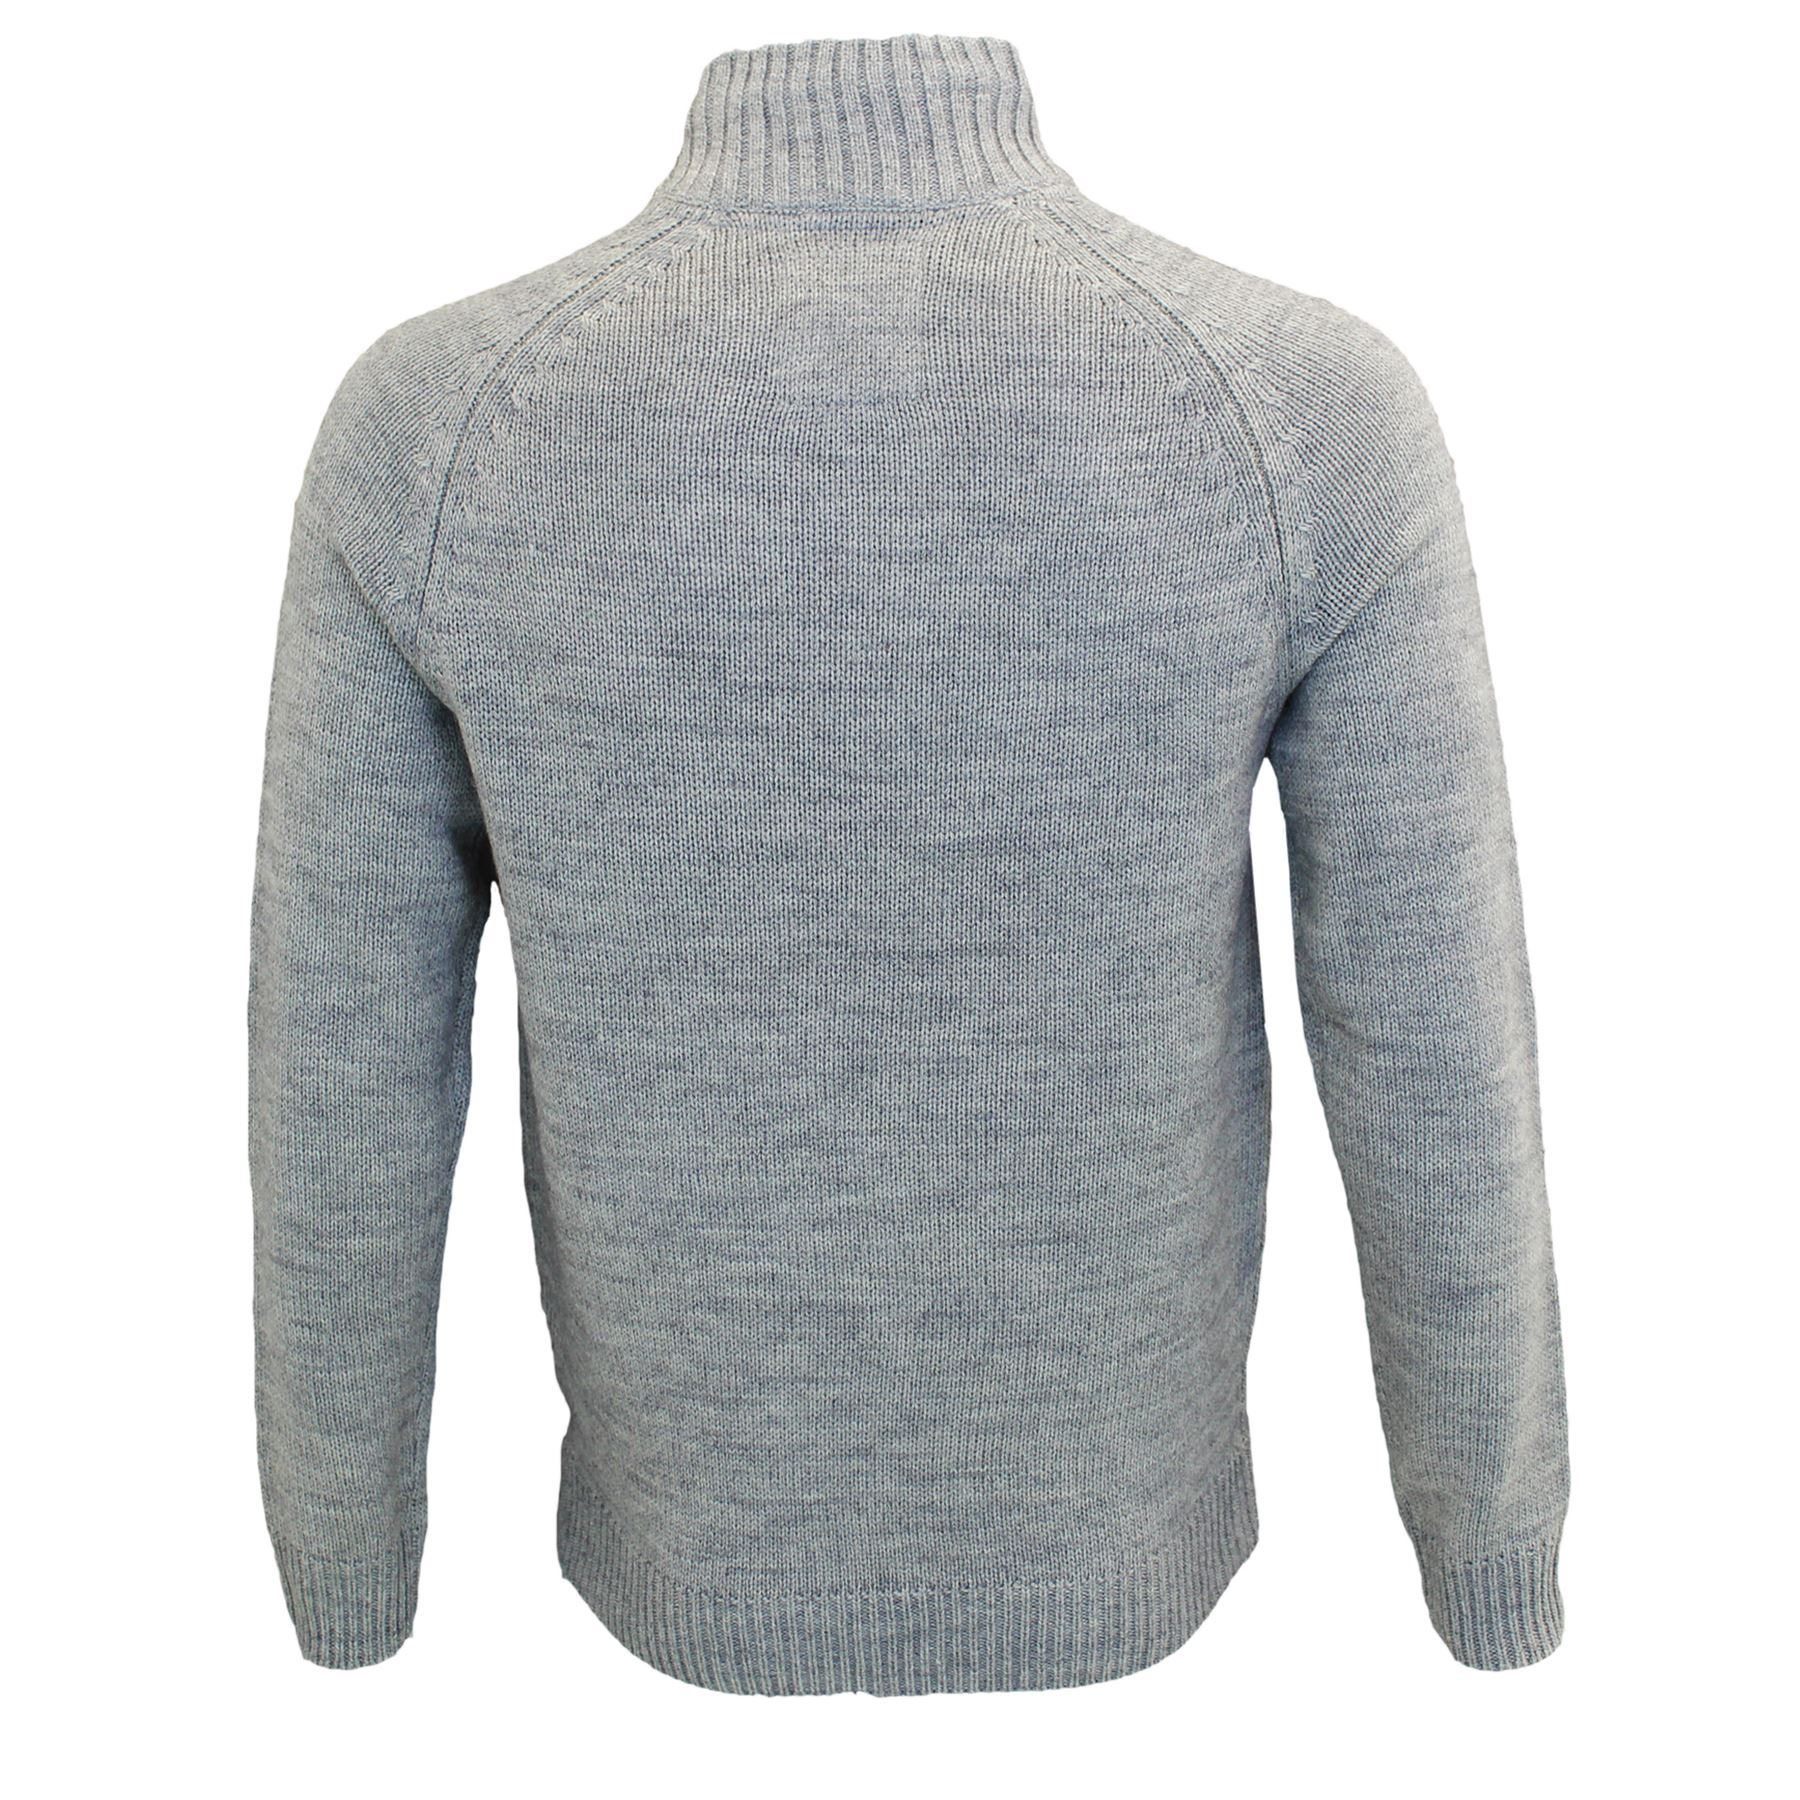 Mens Threadbare Thin Knit Zip up Borg Lined Funnel Neck Jumper Winter Sweater